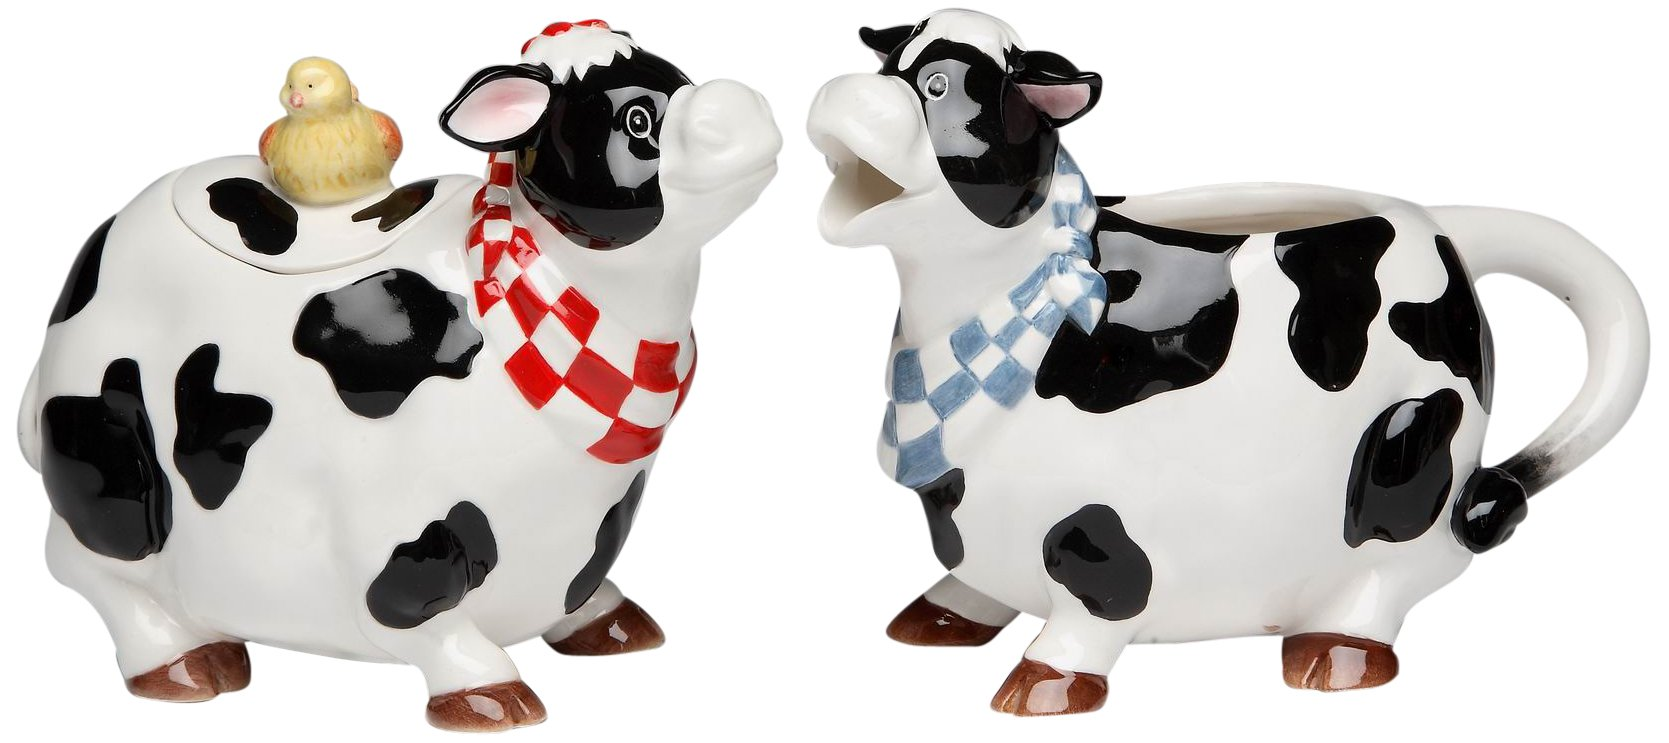 Appletree Design Barn Yard Cow Sugar and Creamer Set, 4-3/8-Inch, 4-1/2-Inch